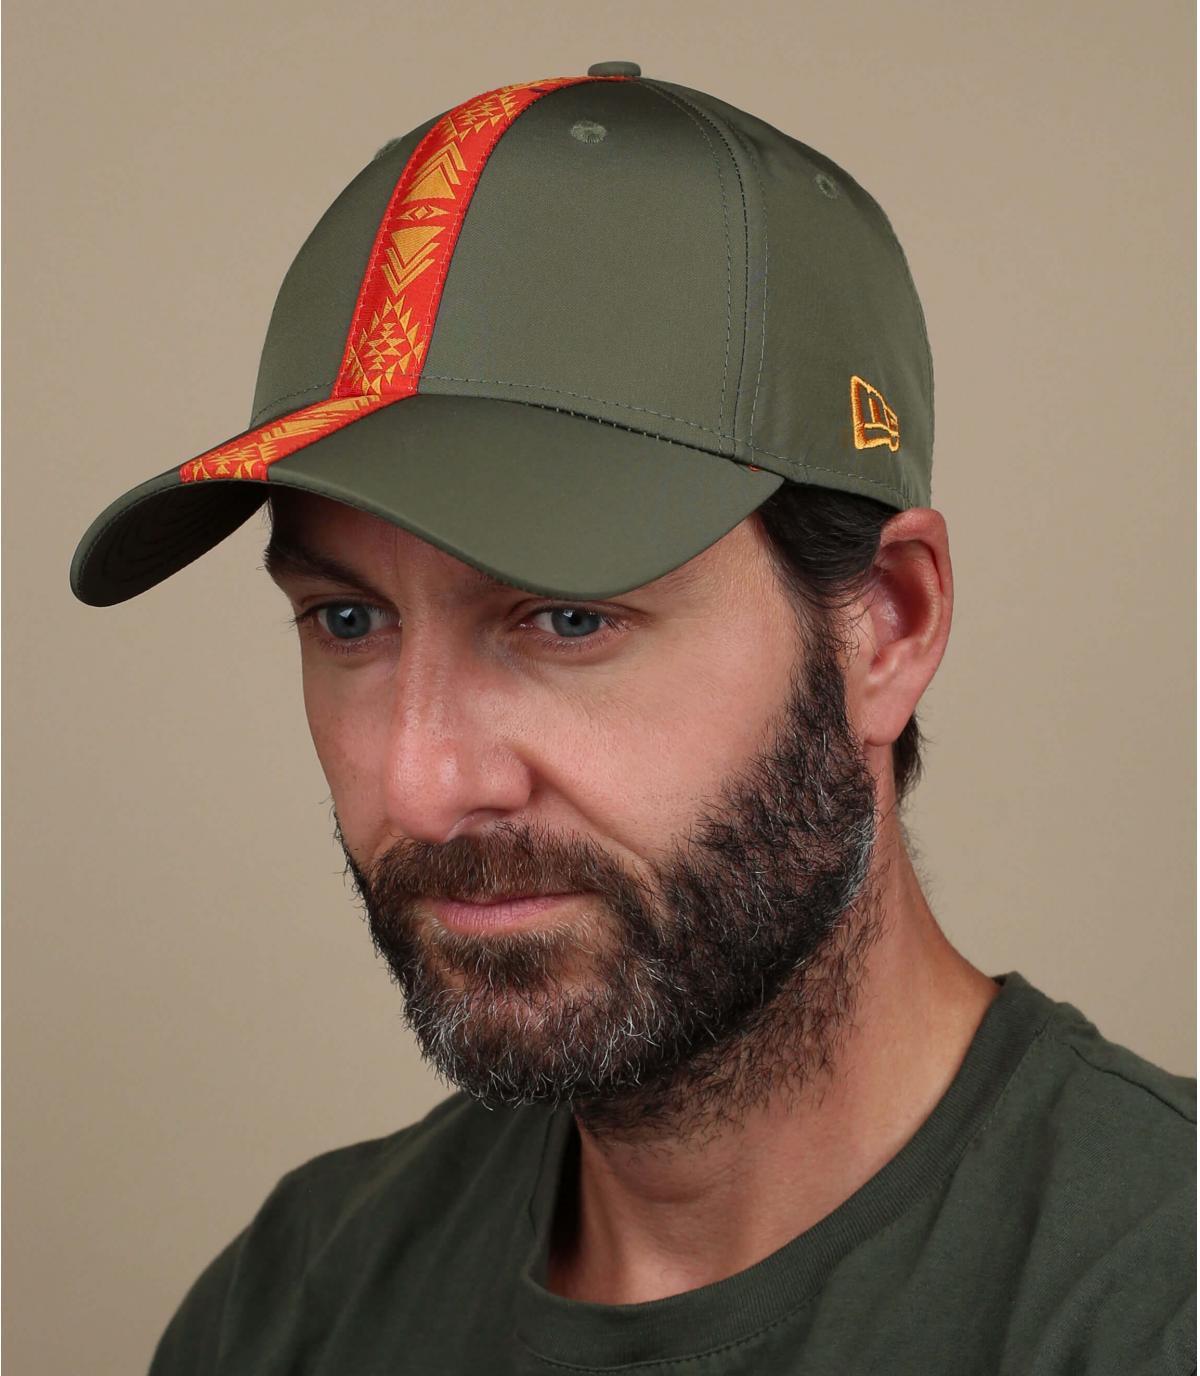 Green cap orange ribbon